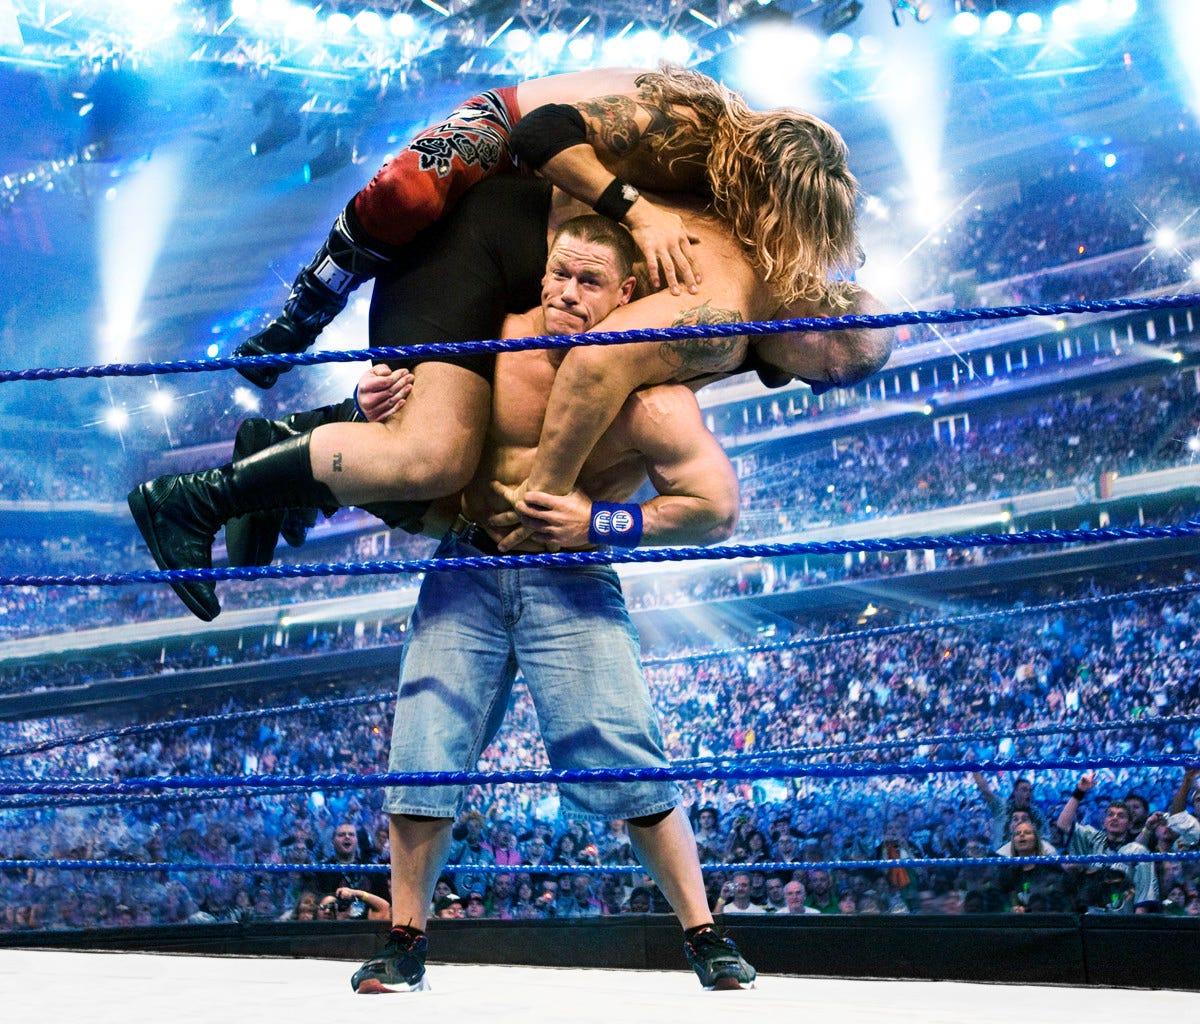 WWE action photo.jpg